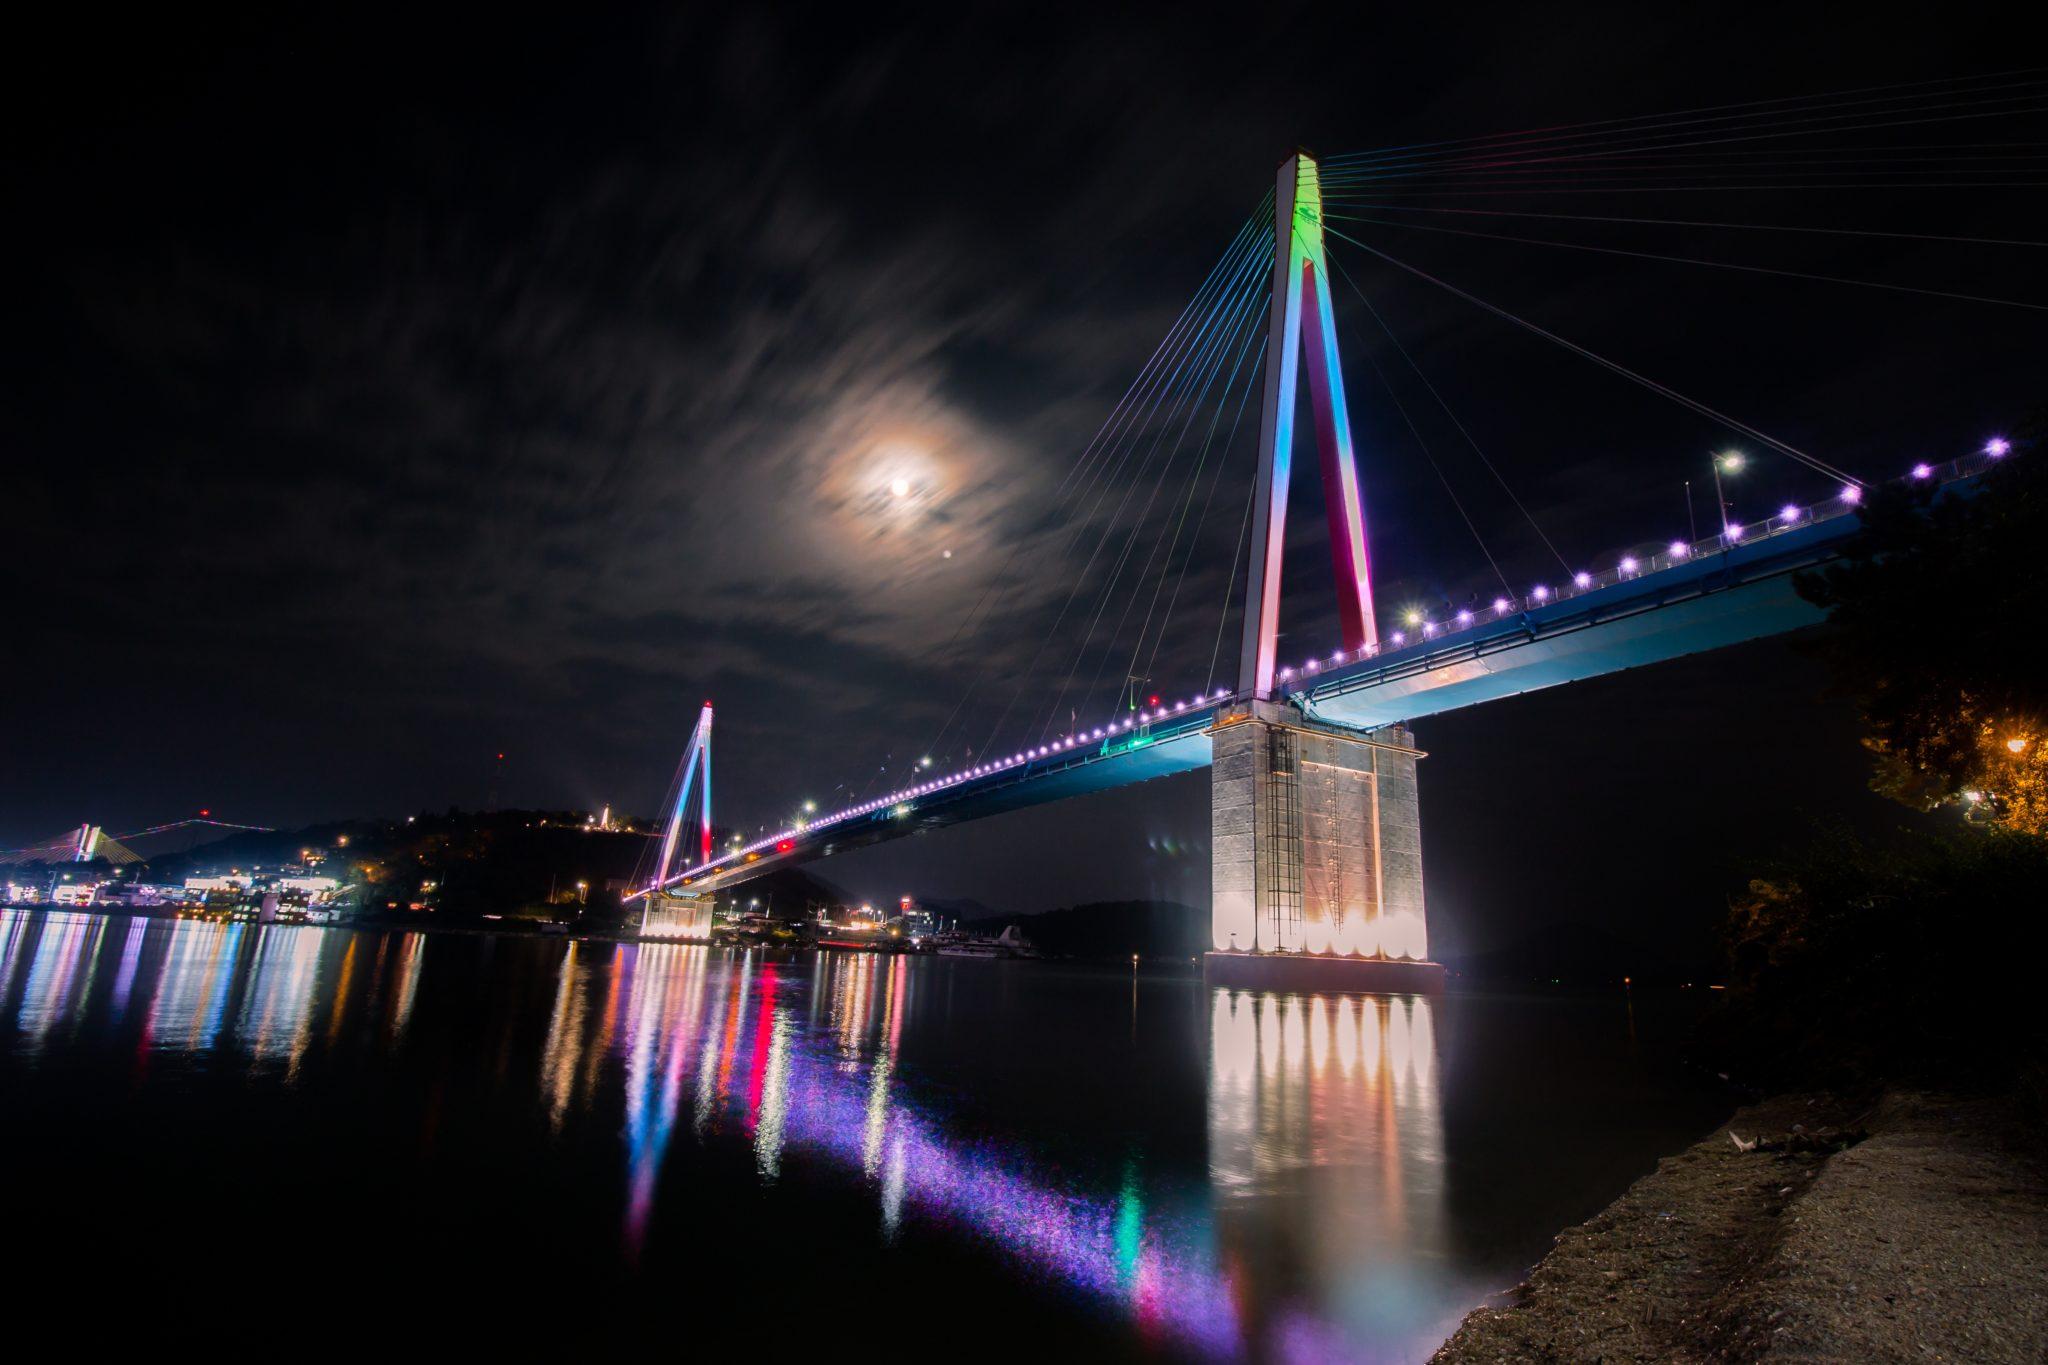 Bridge with multi colored lights